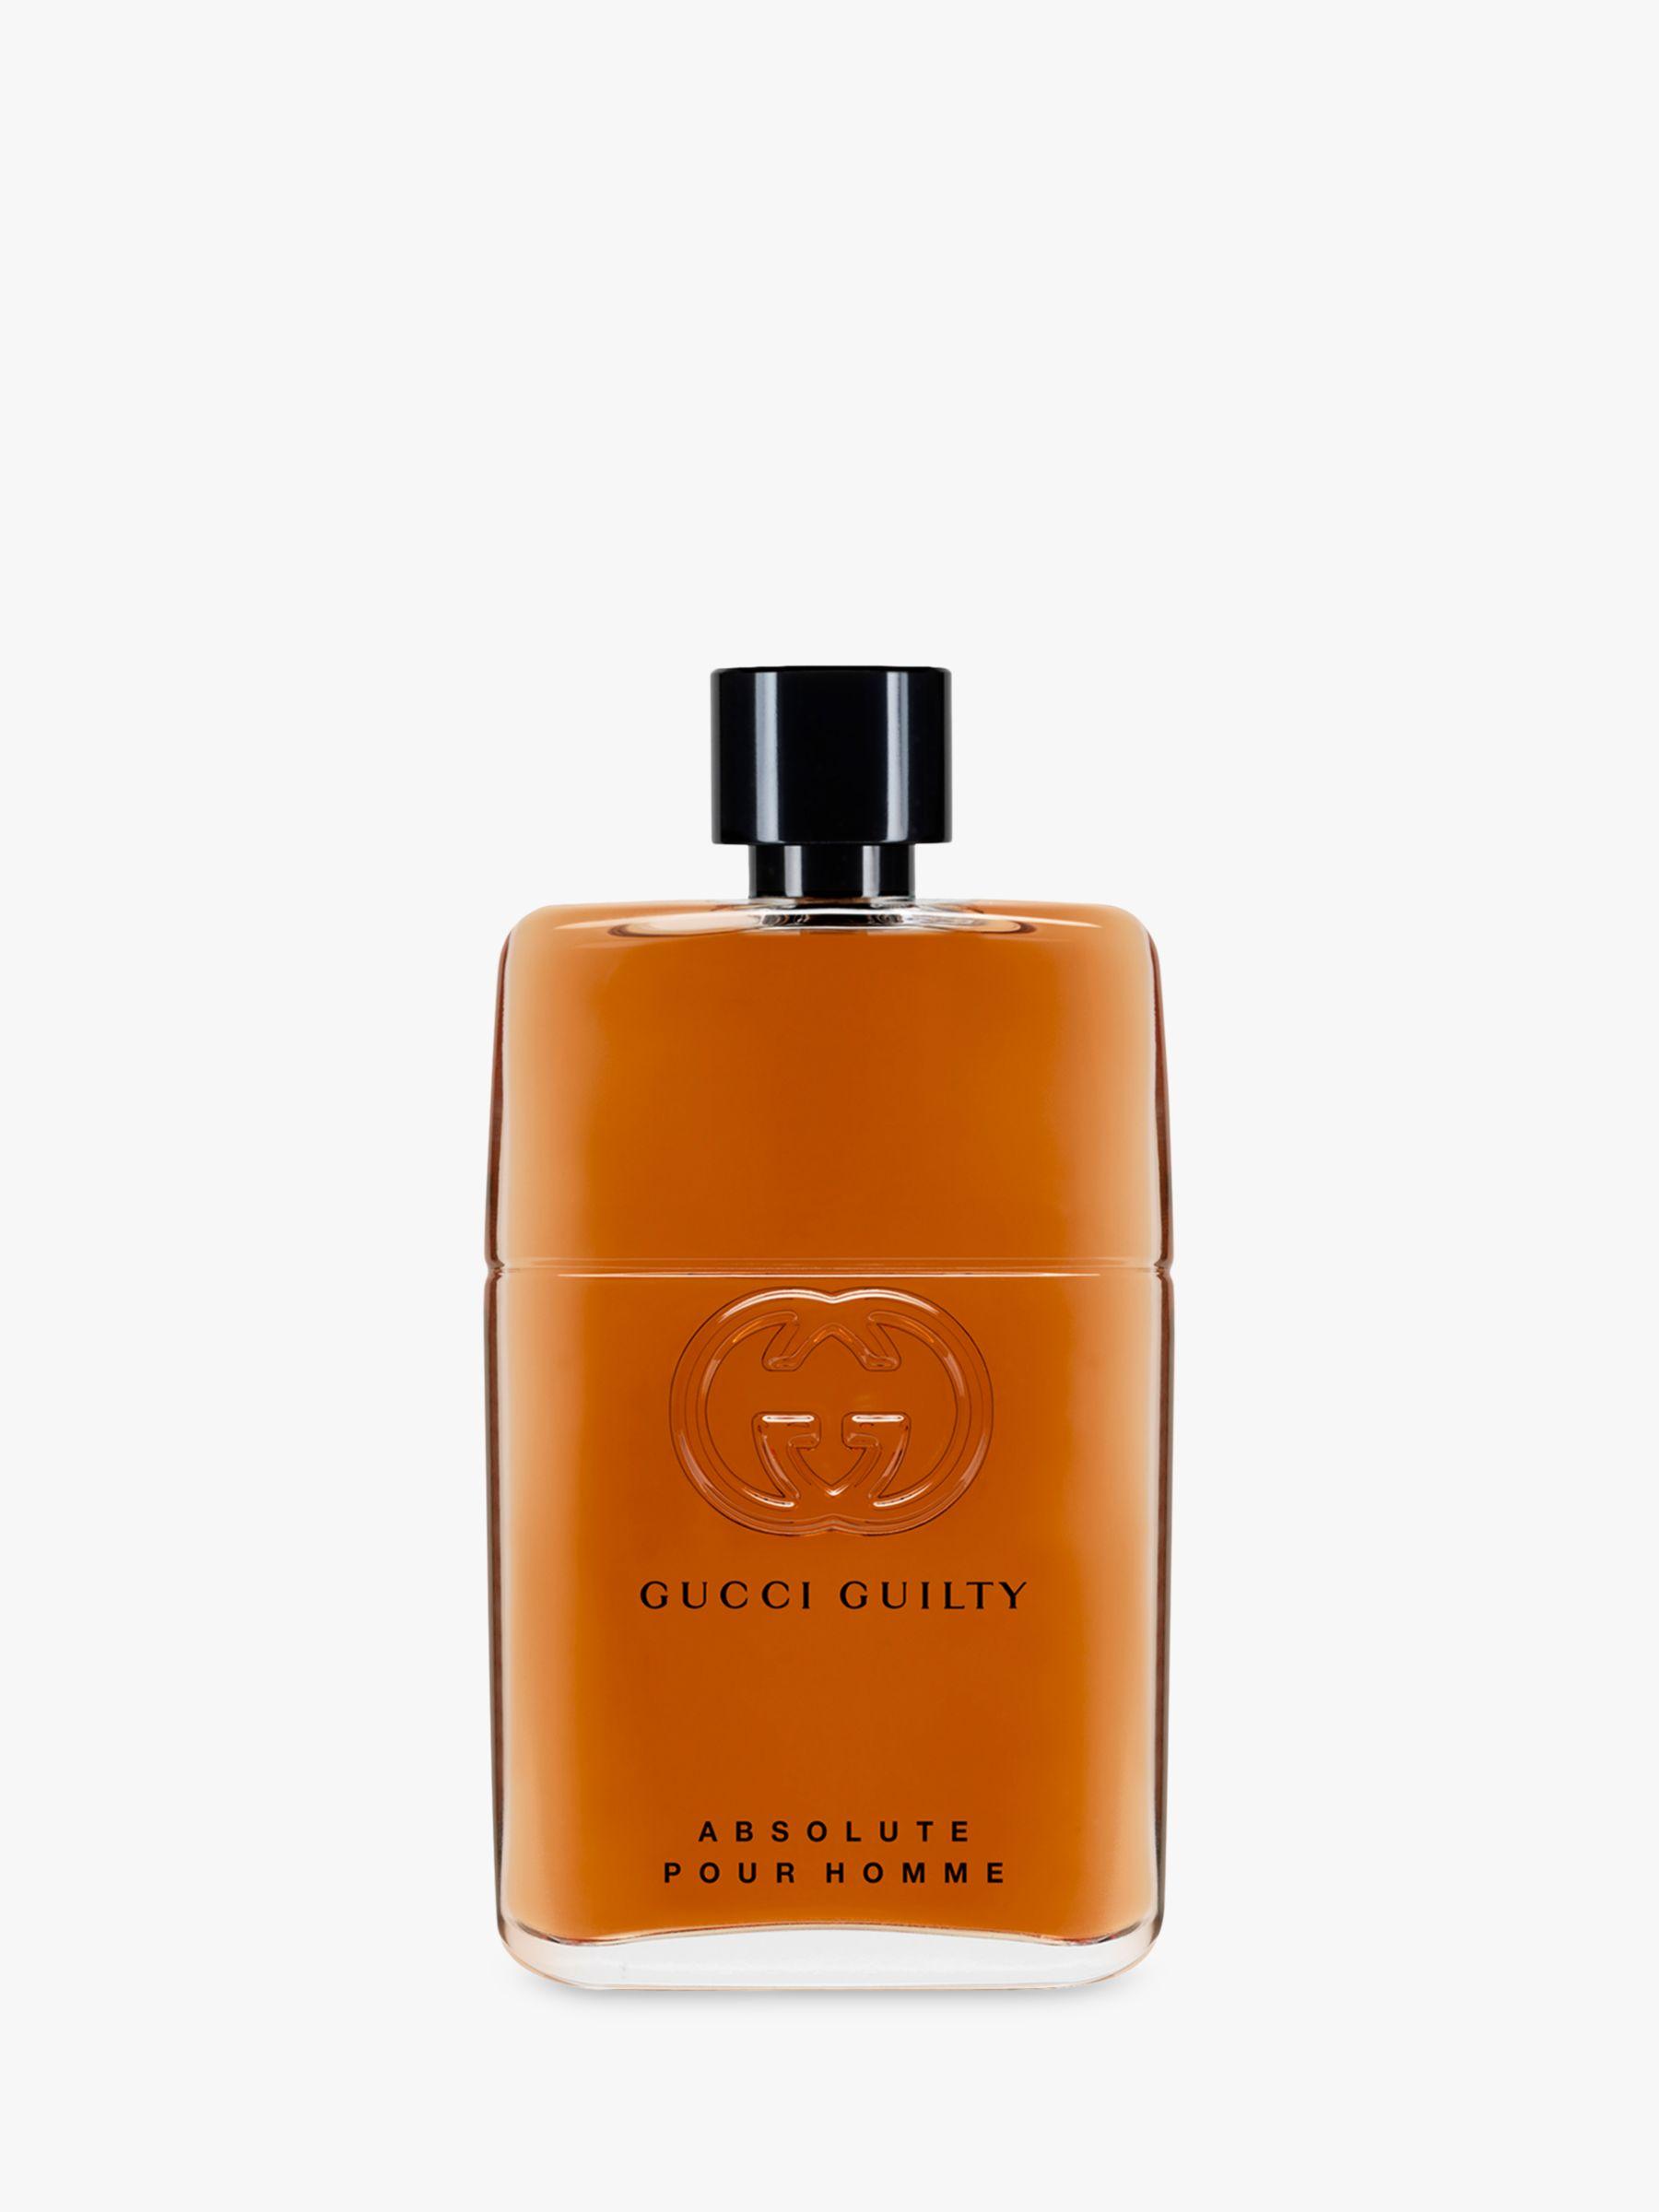 d6aad7be2 Gucci Guilty Absolute Eau de Parfum for Him at John Lewis & Partners